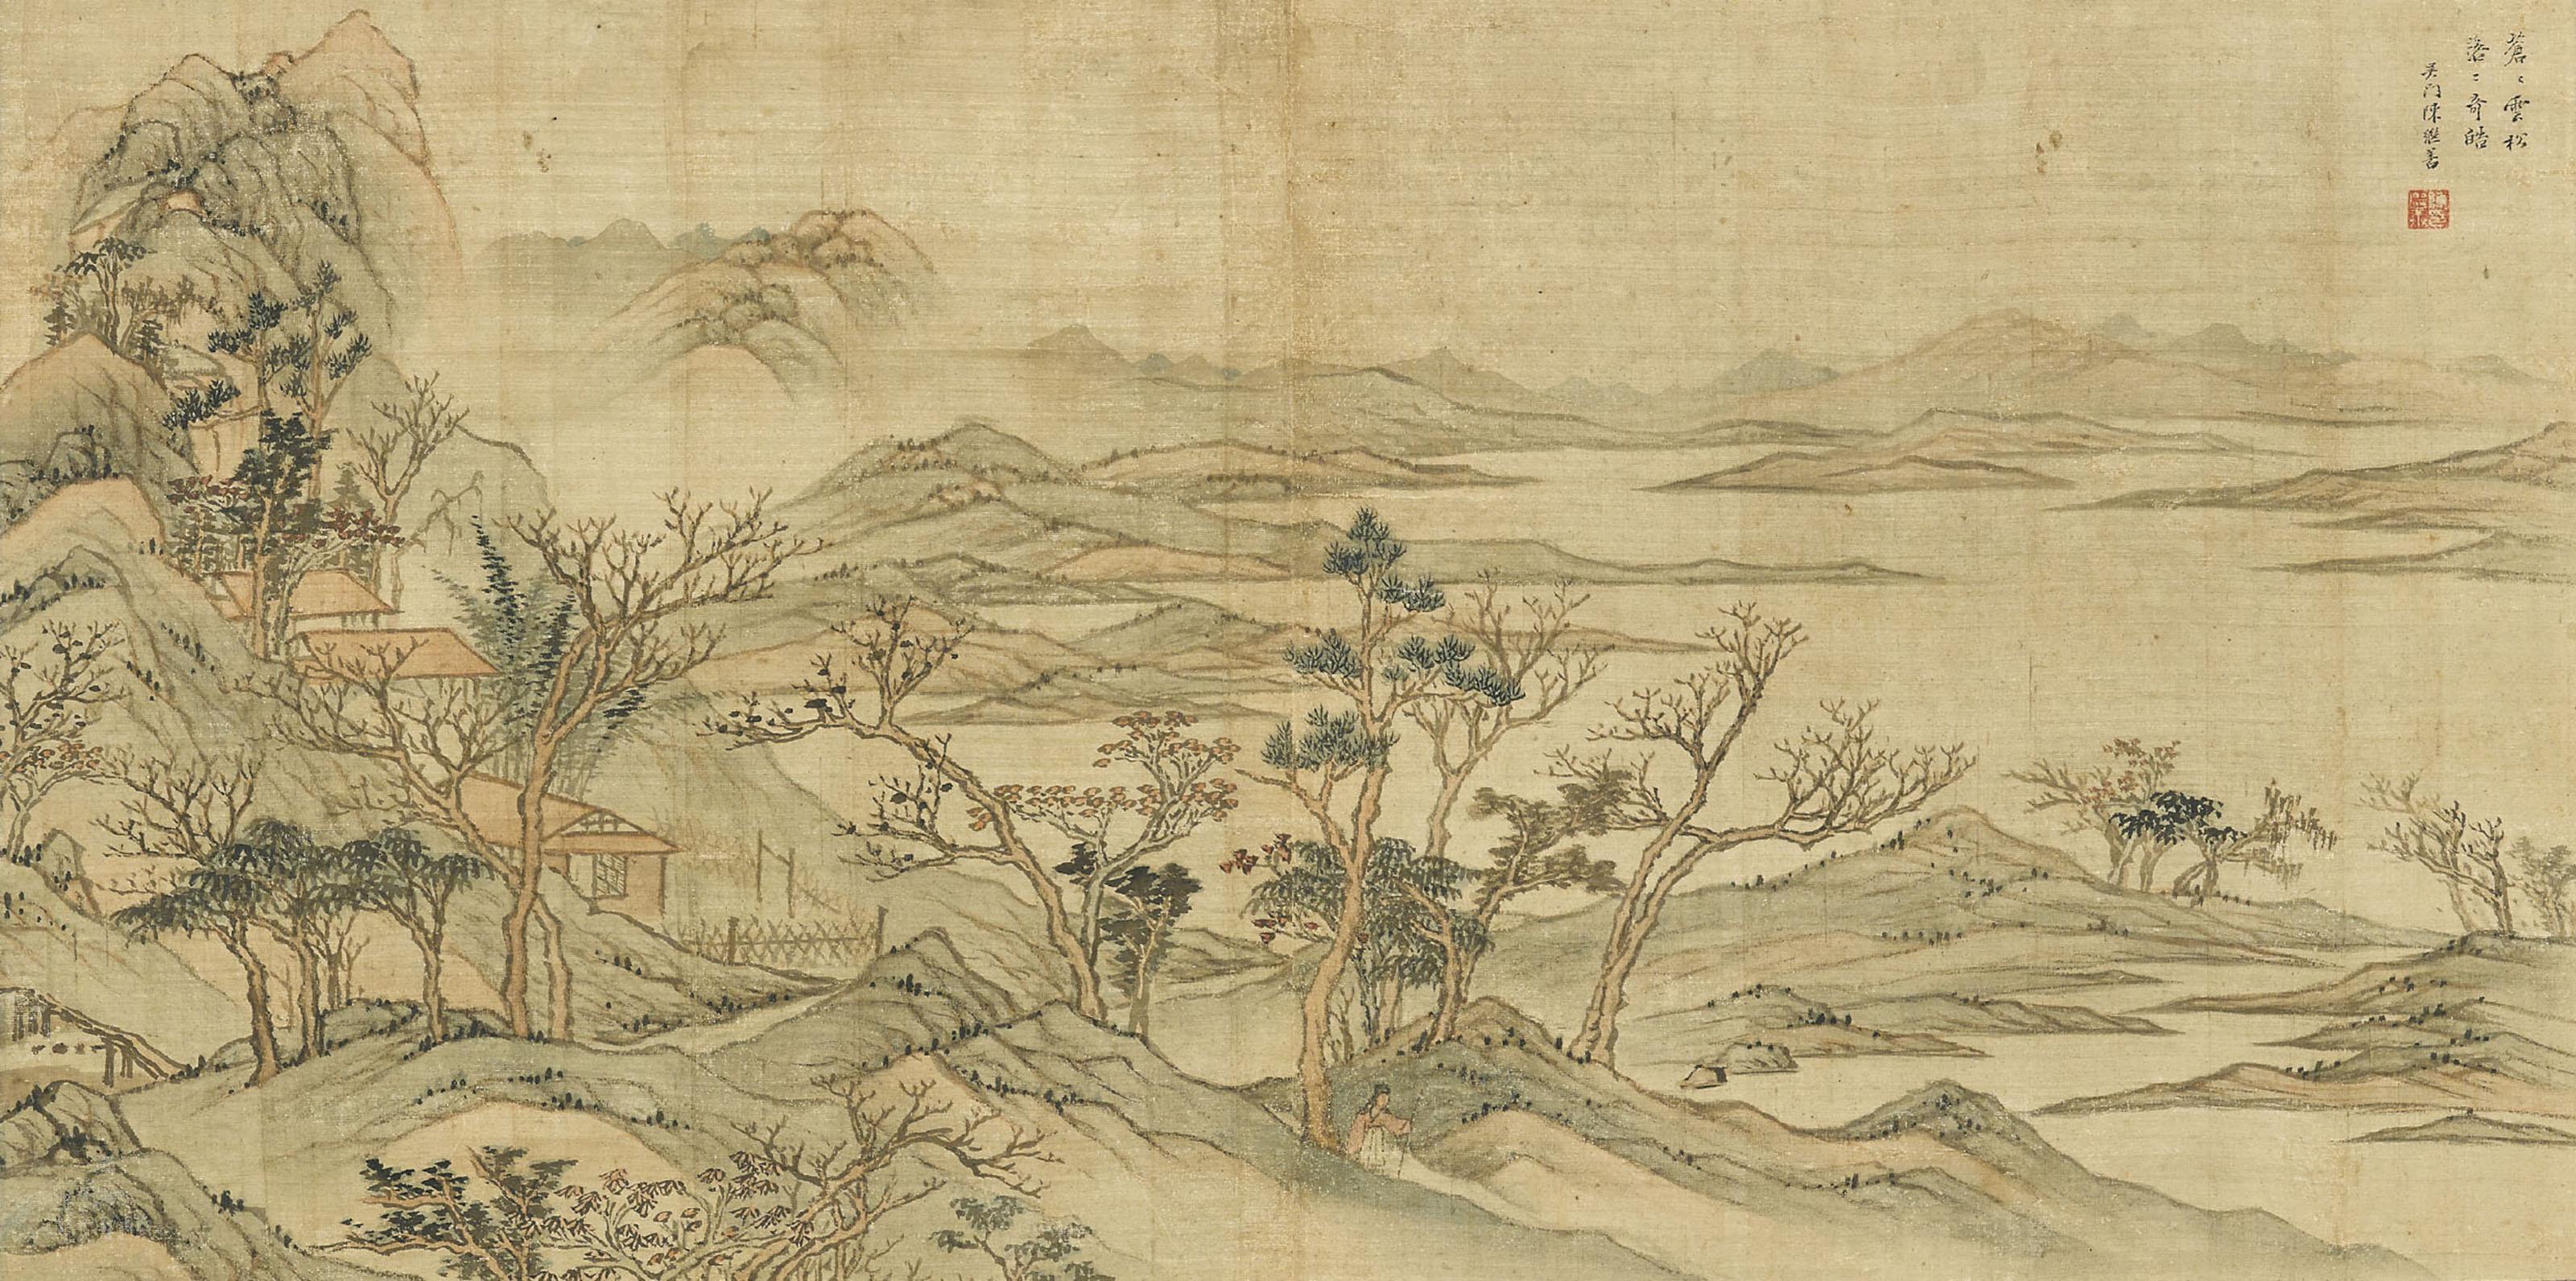 CHEN JISHAN (16TH CENTURY)